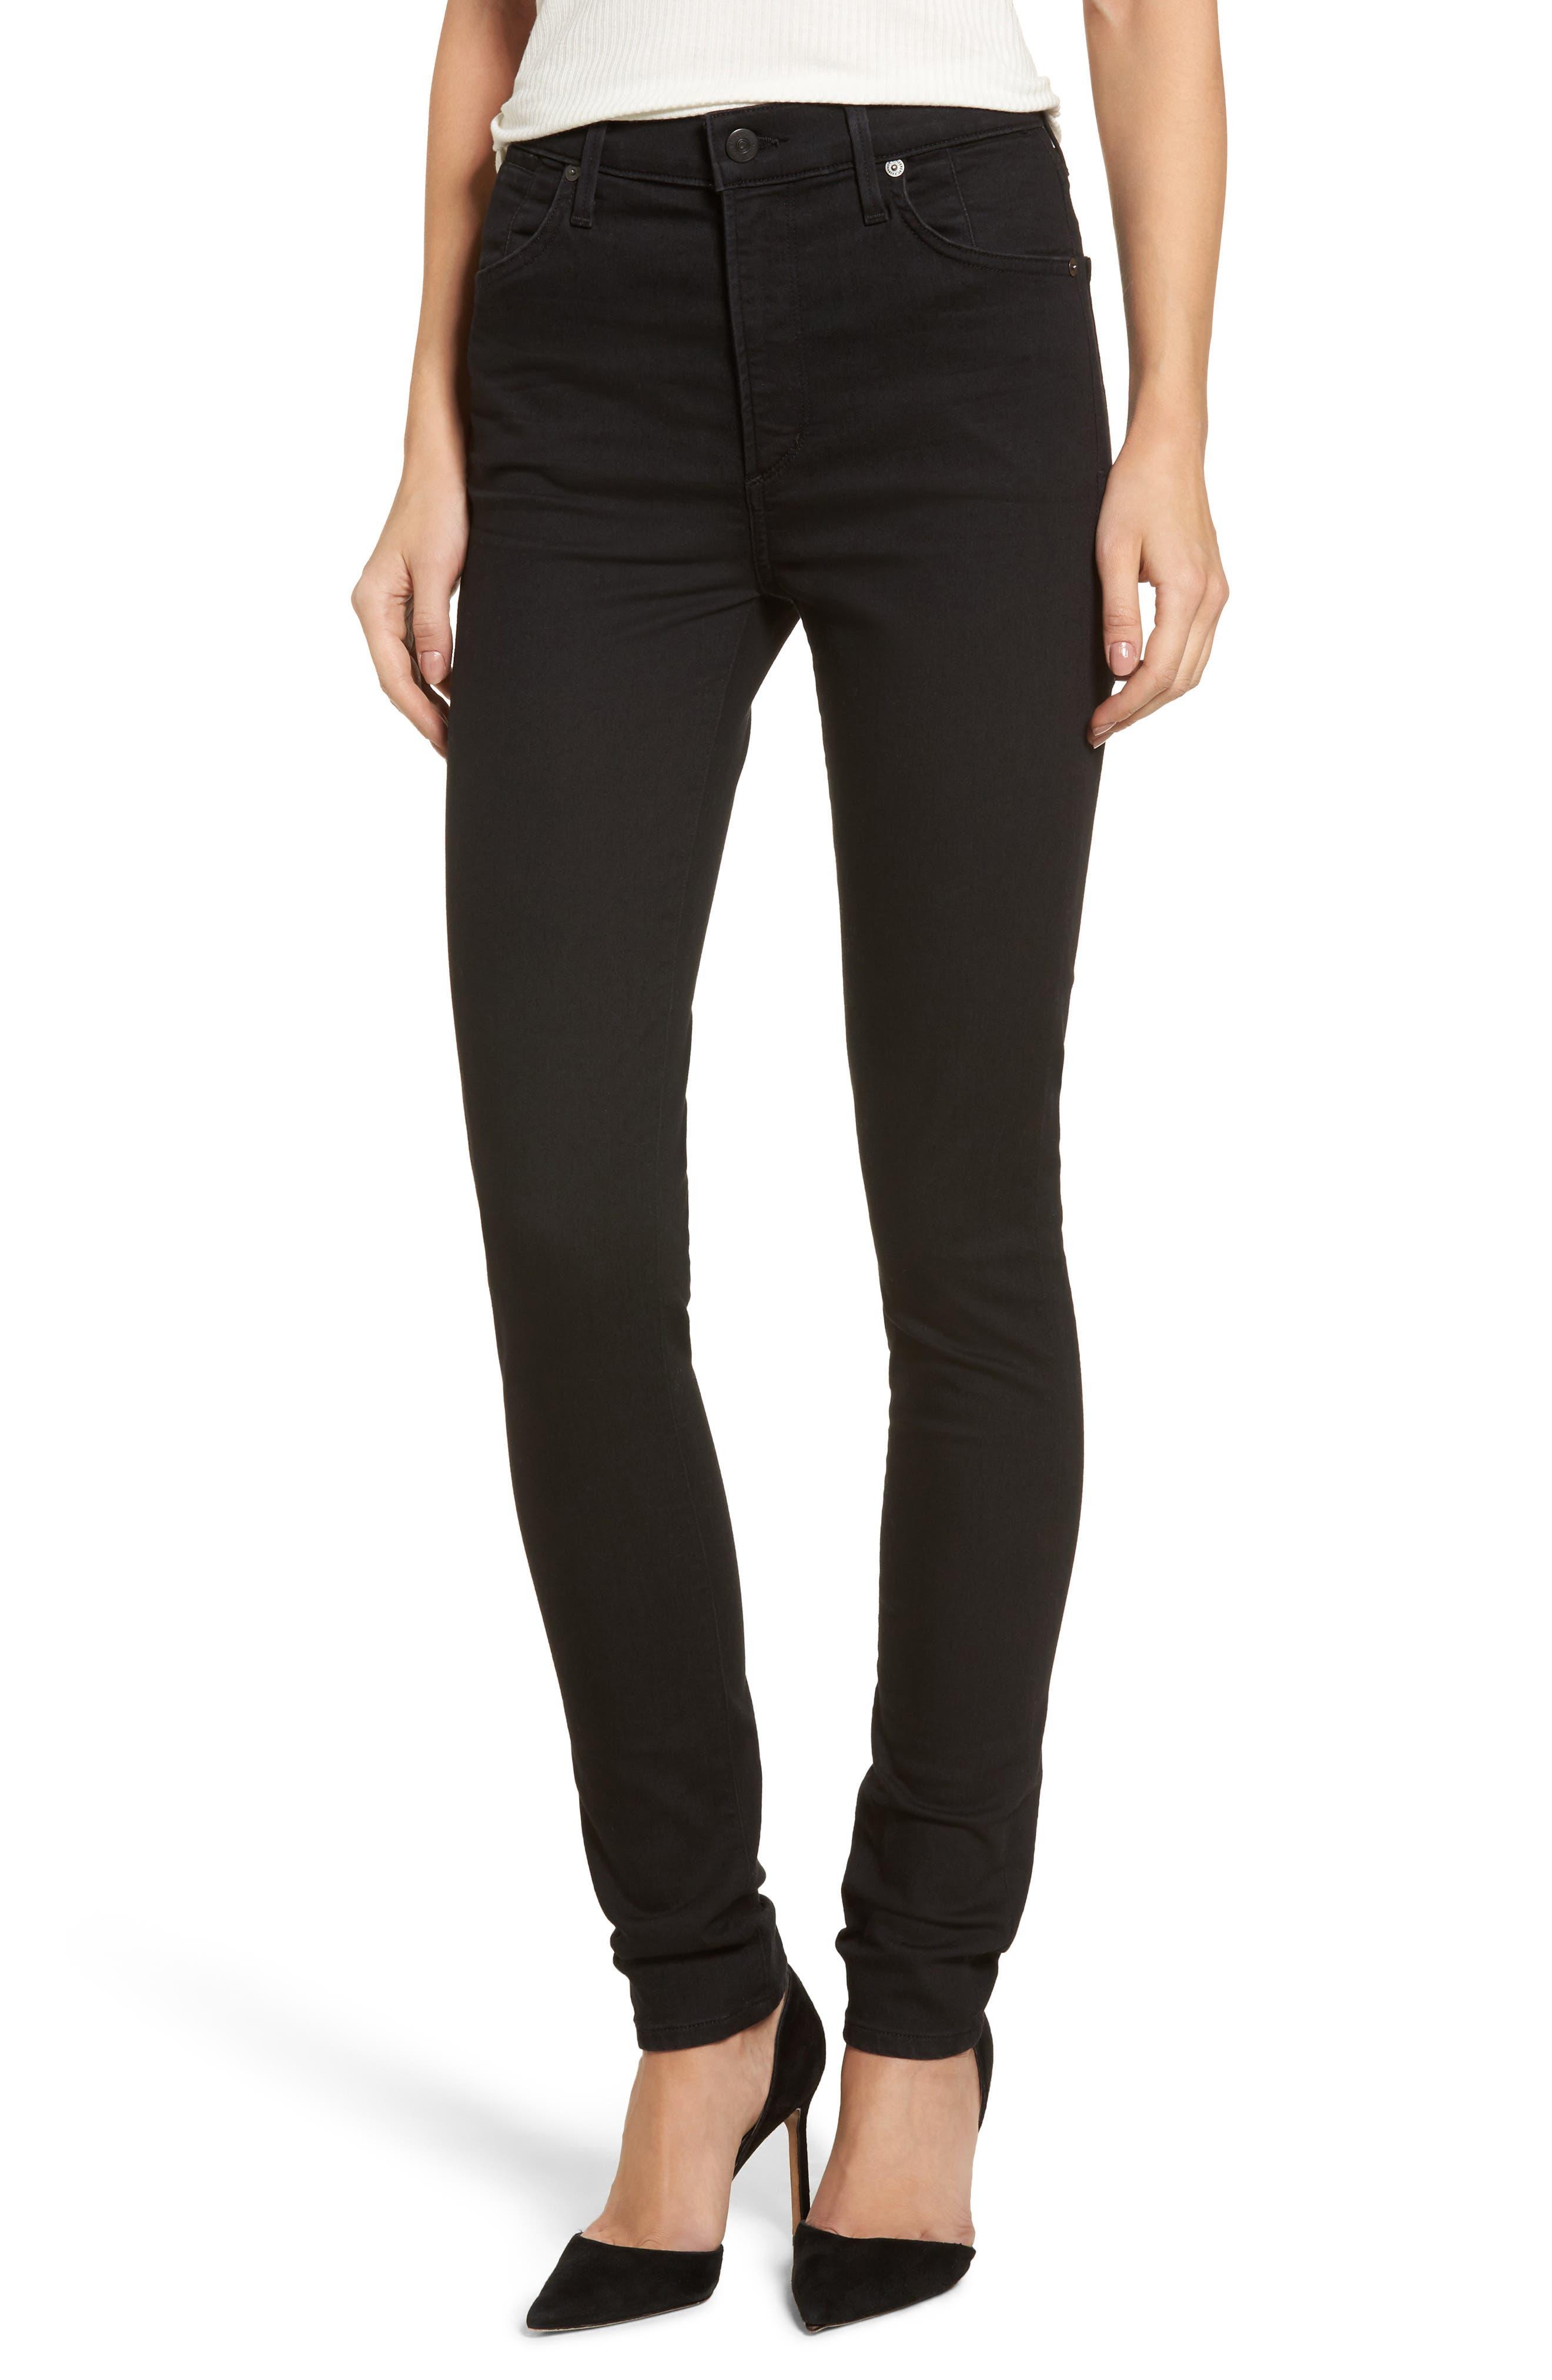 Carlie High Waist Skinny Jeans,                             Main thumbnail 1, color,                             011